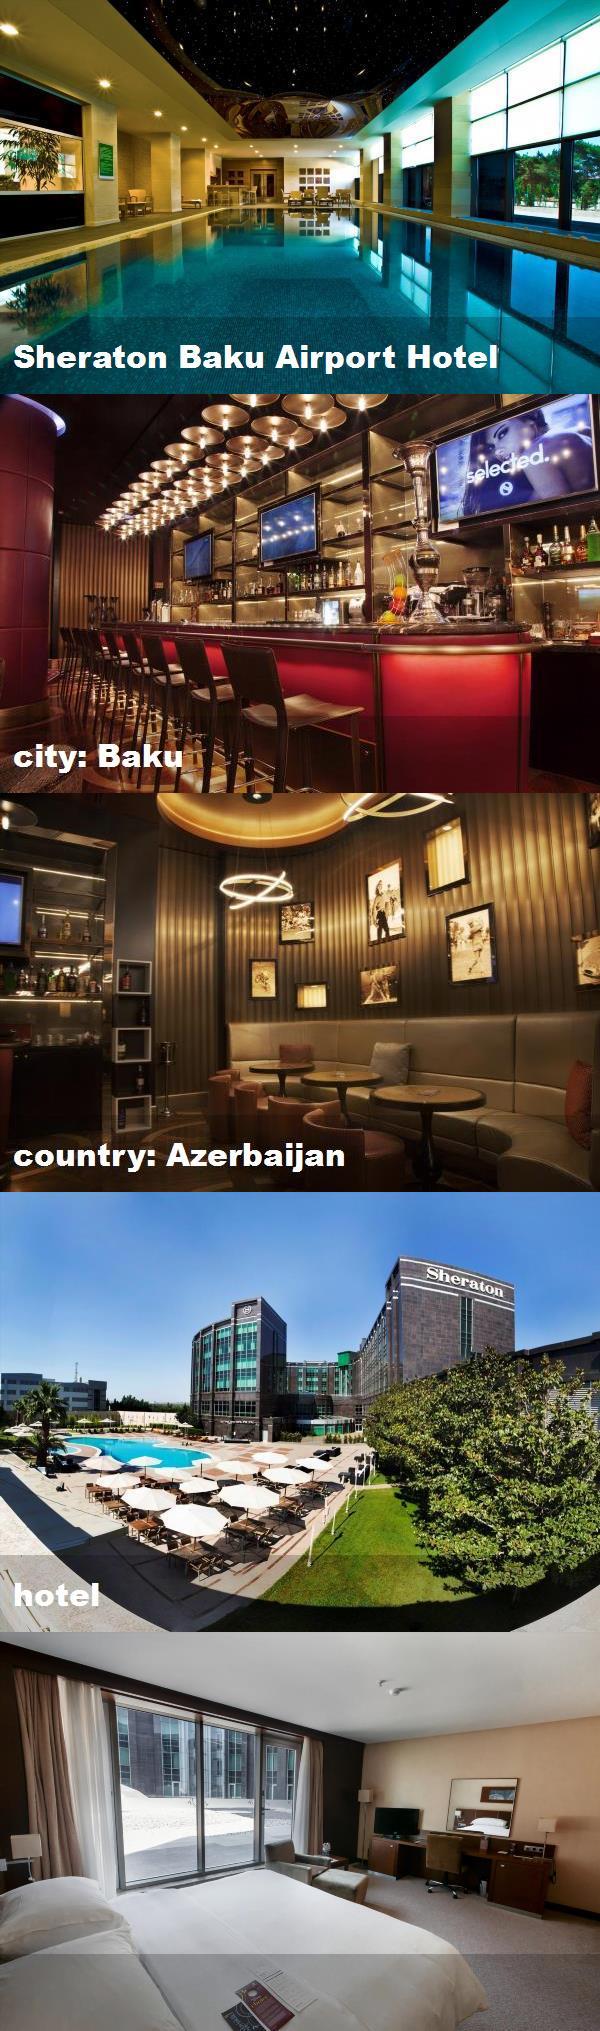 Sheraton Baku Airport Hotel City Baku Country Azerbaijan Hotel Hotel Baku Airport Airport Hotel